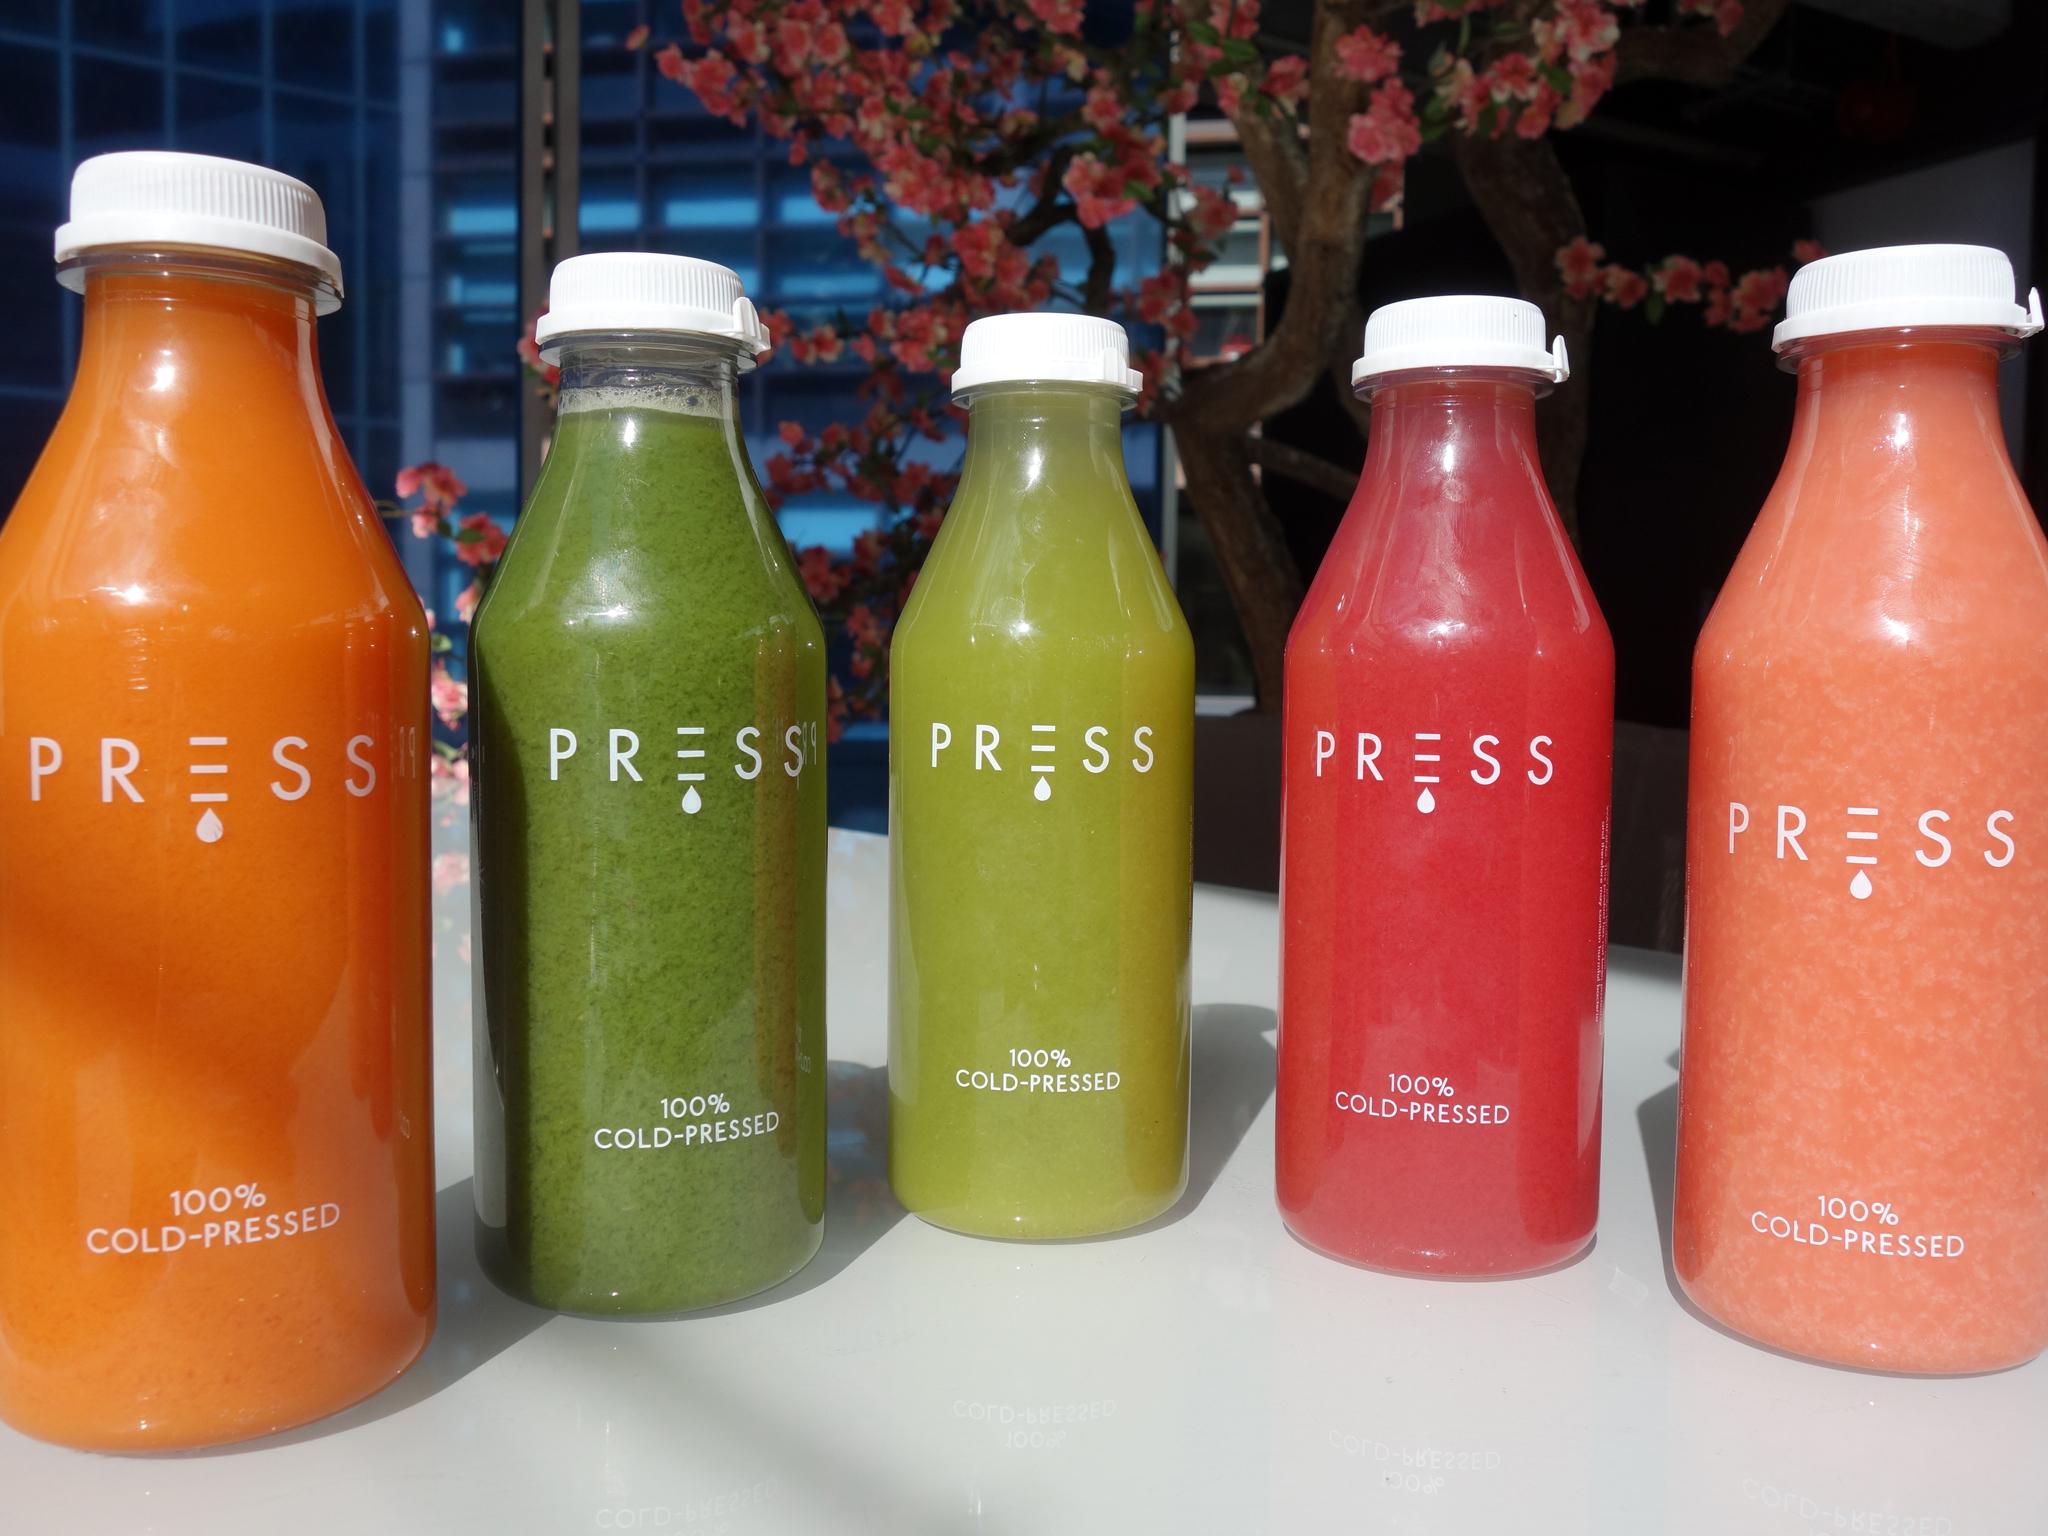 London's best juice bars, Press Juice Bar